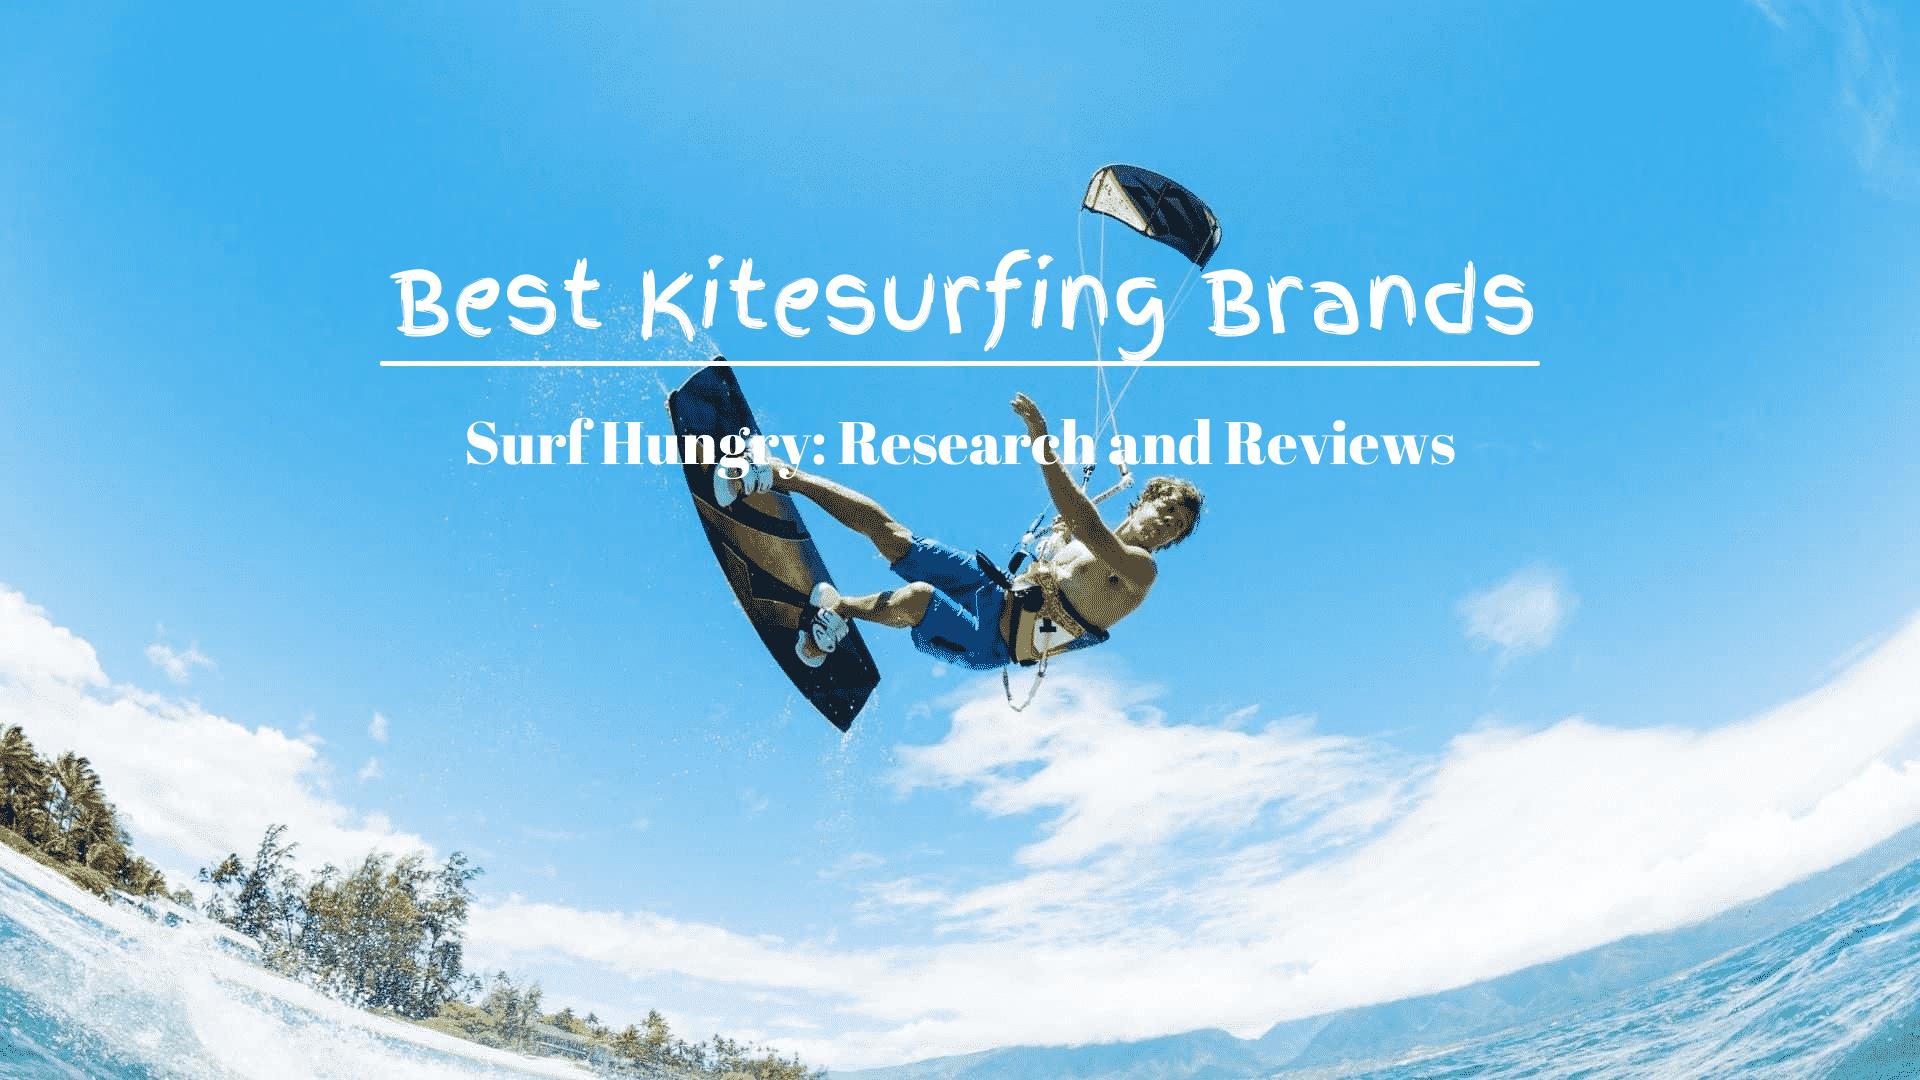 Best Kitesurfing Brands